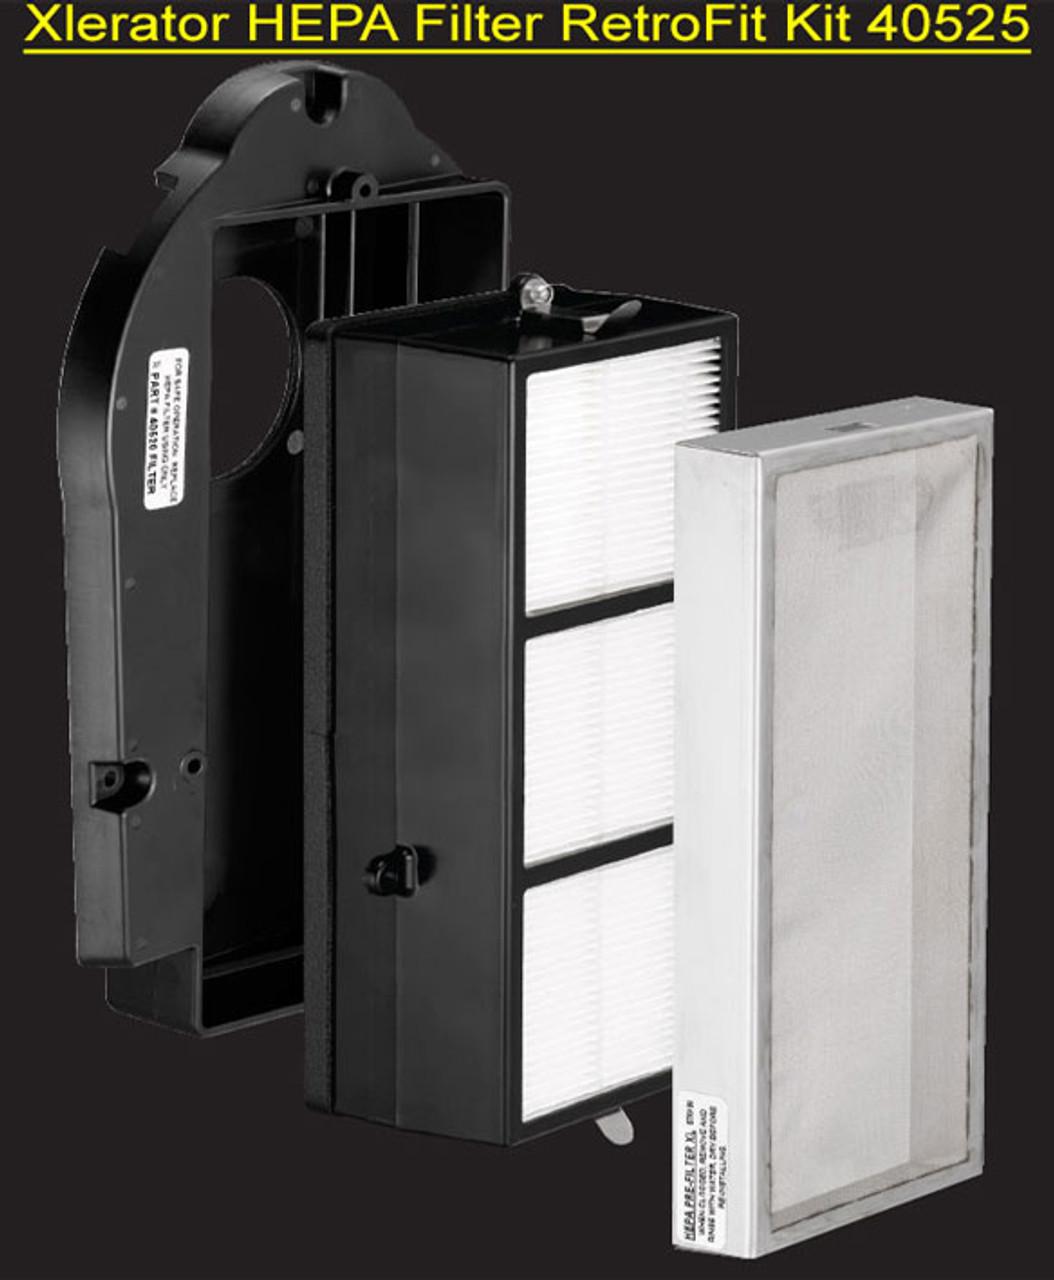 Xlerator Hand Dryer HEPA Filter Kit 40525 on